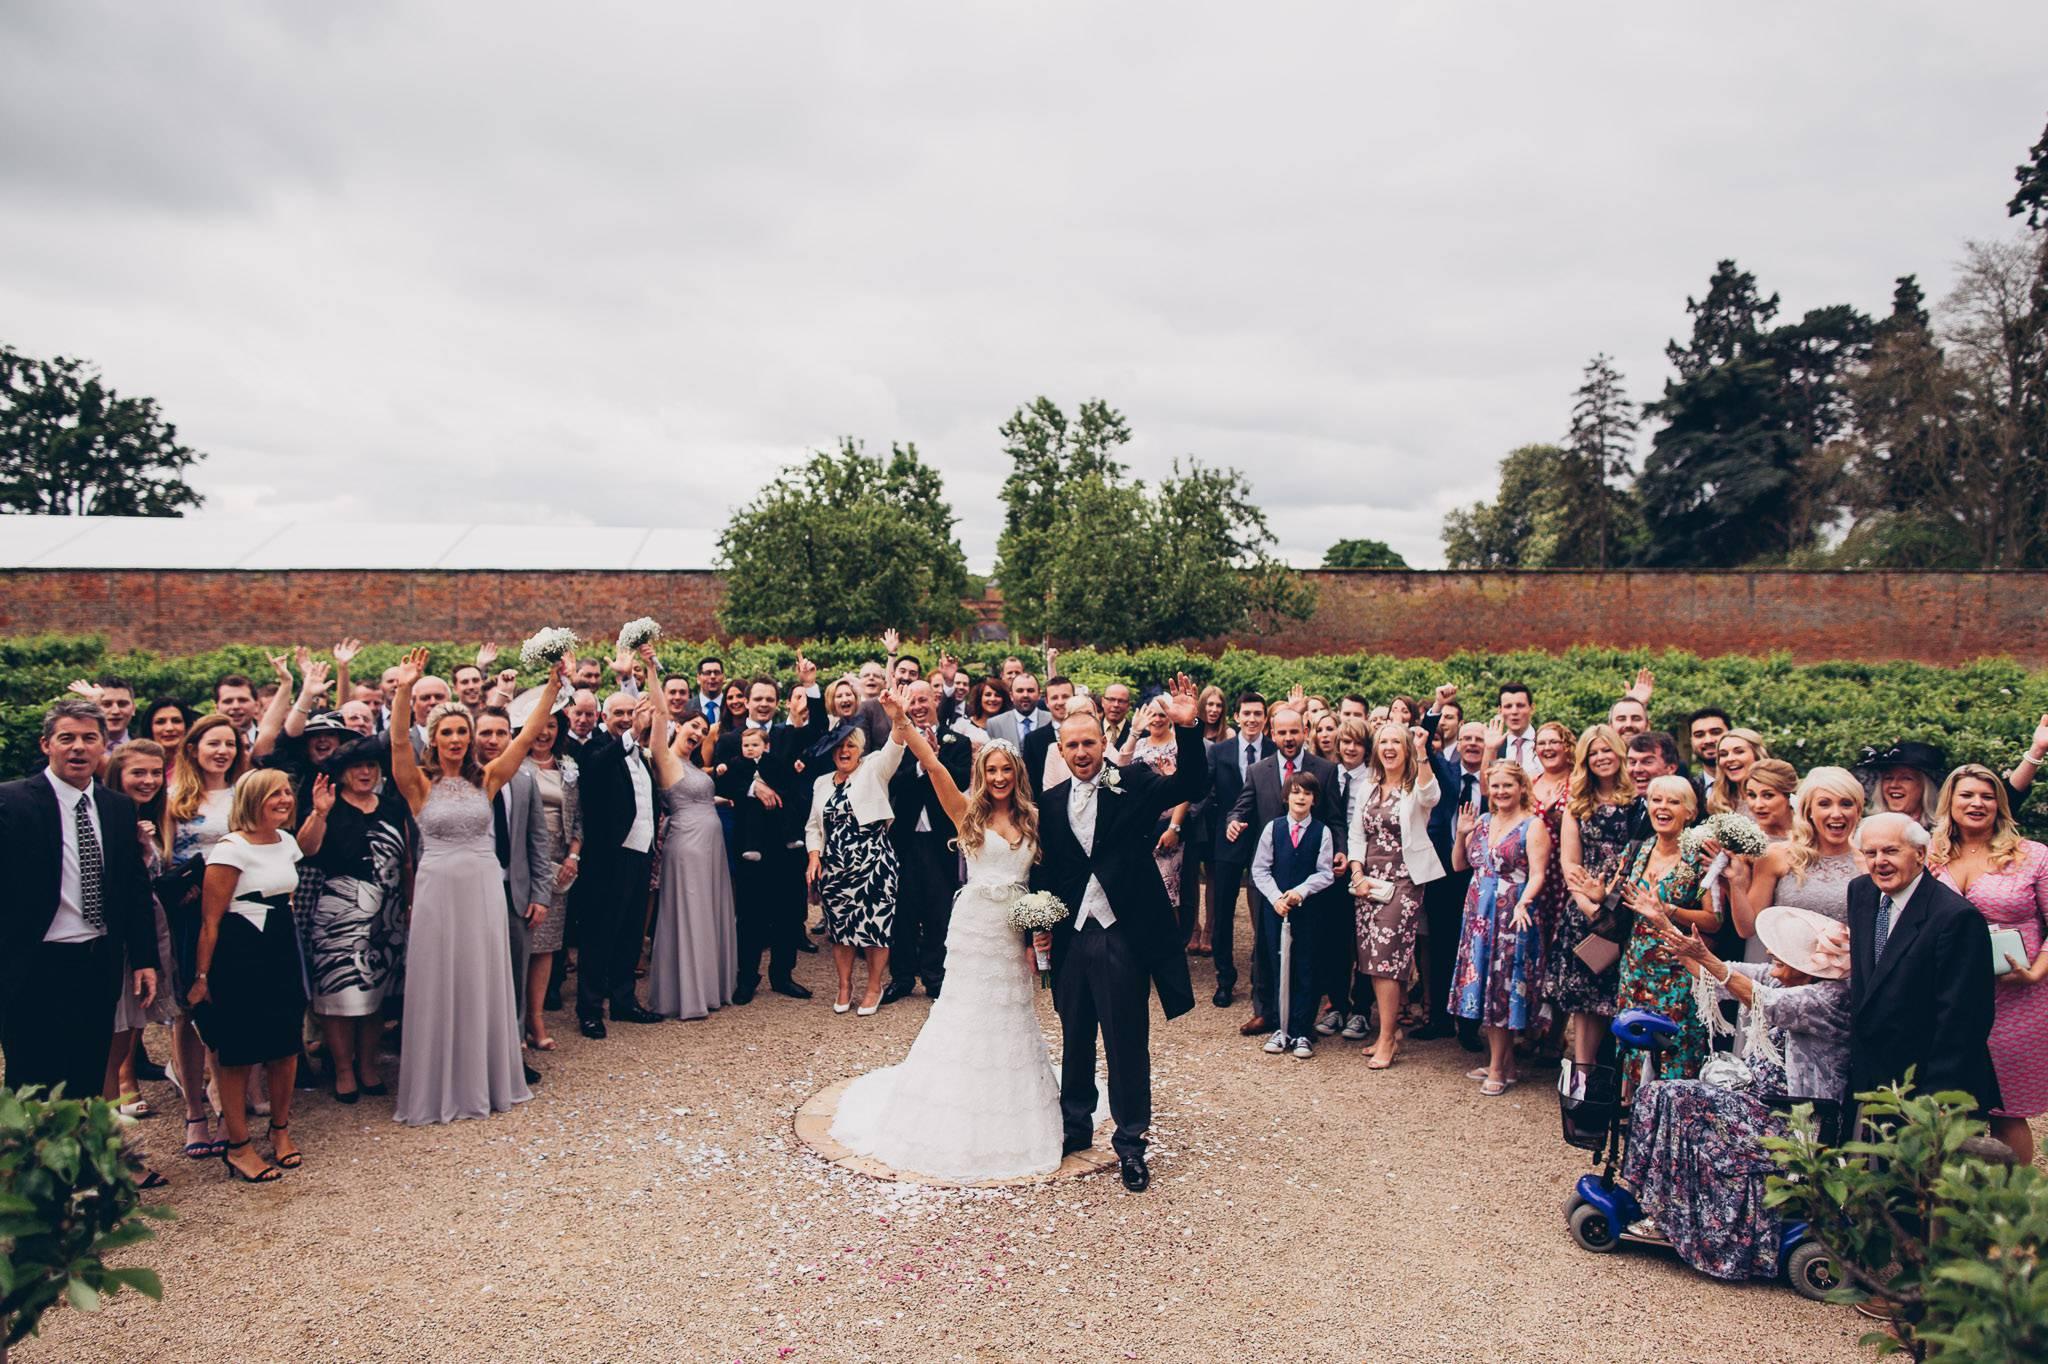 shropshire-wedding-photography 14.jpg